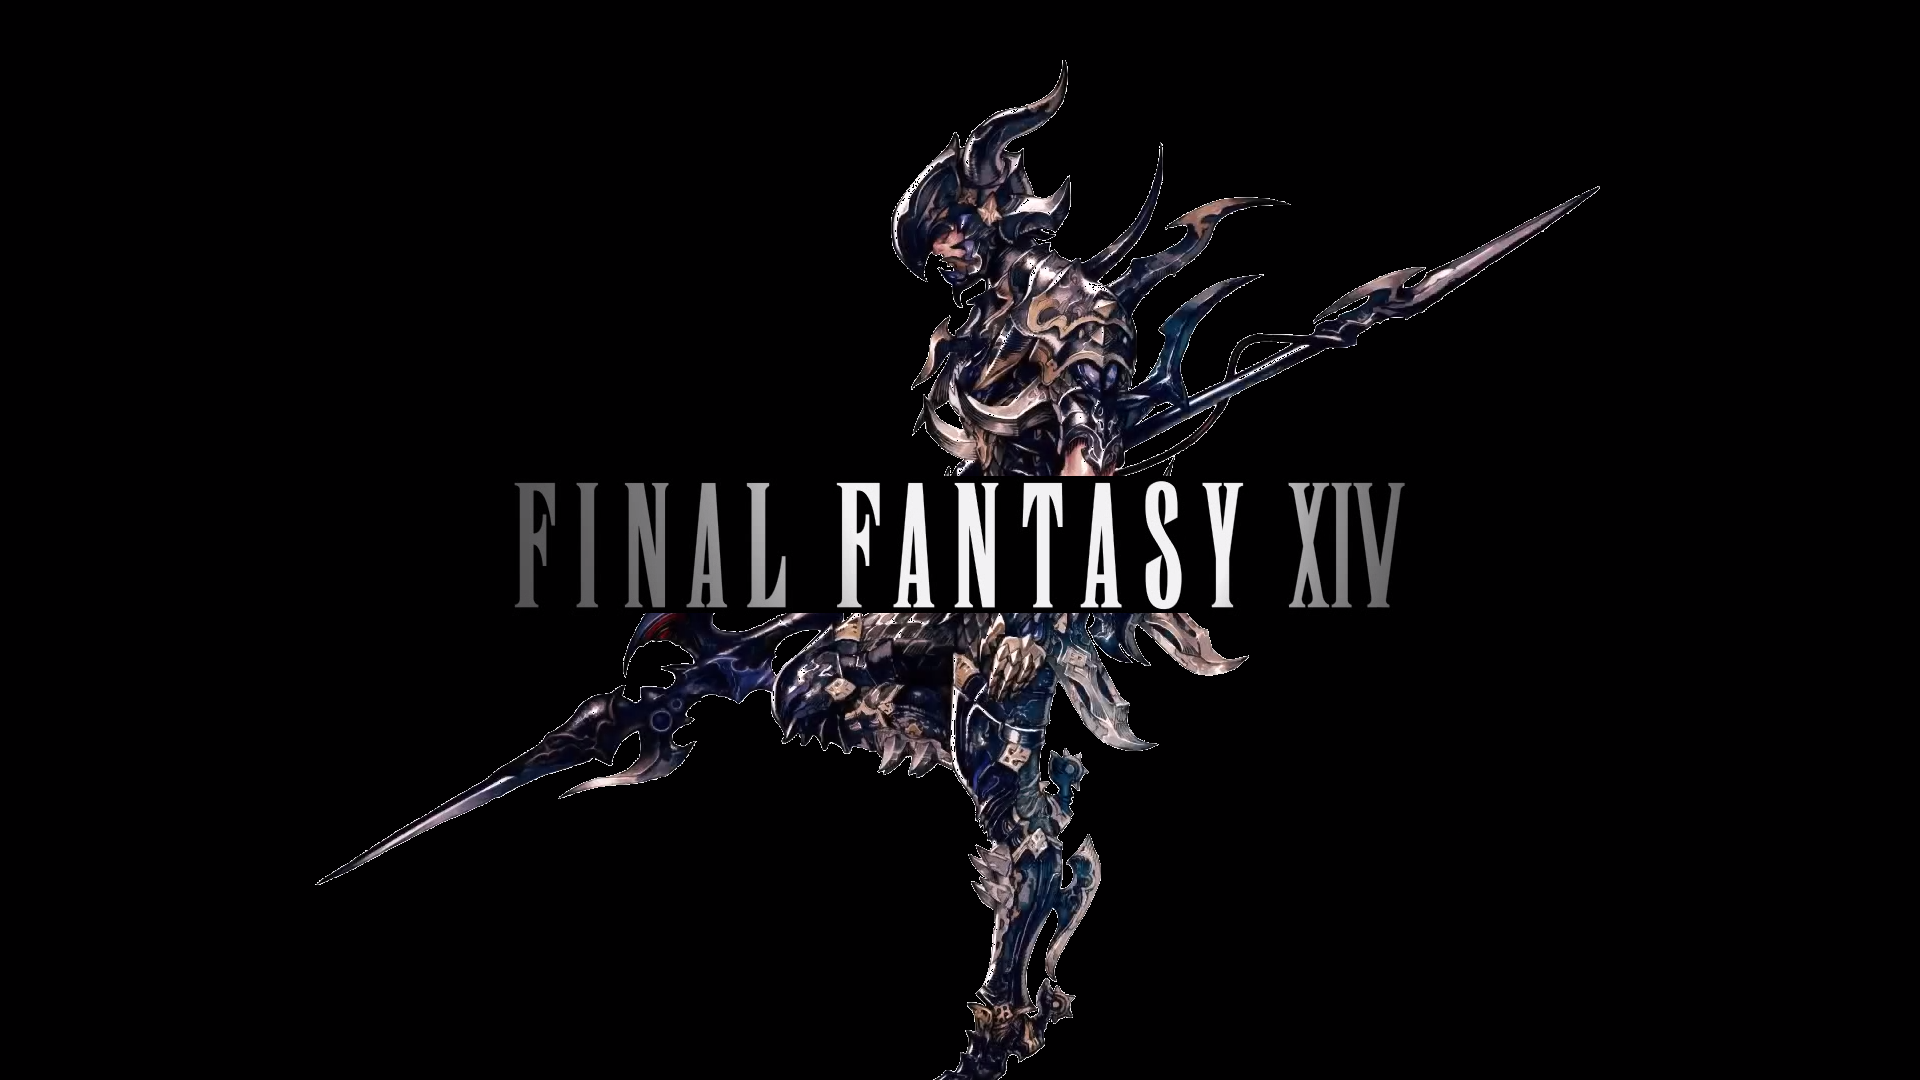 Final Fantasy Xiv 4k Hd Desktop Wallpaper For 4k Ultra Hd: Final Fantasy XIV Wallpapers, Pictures, Images